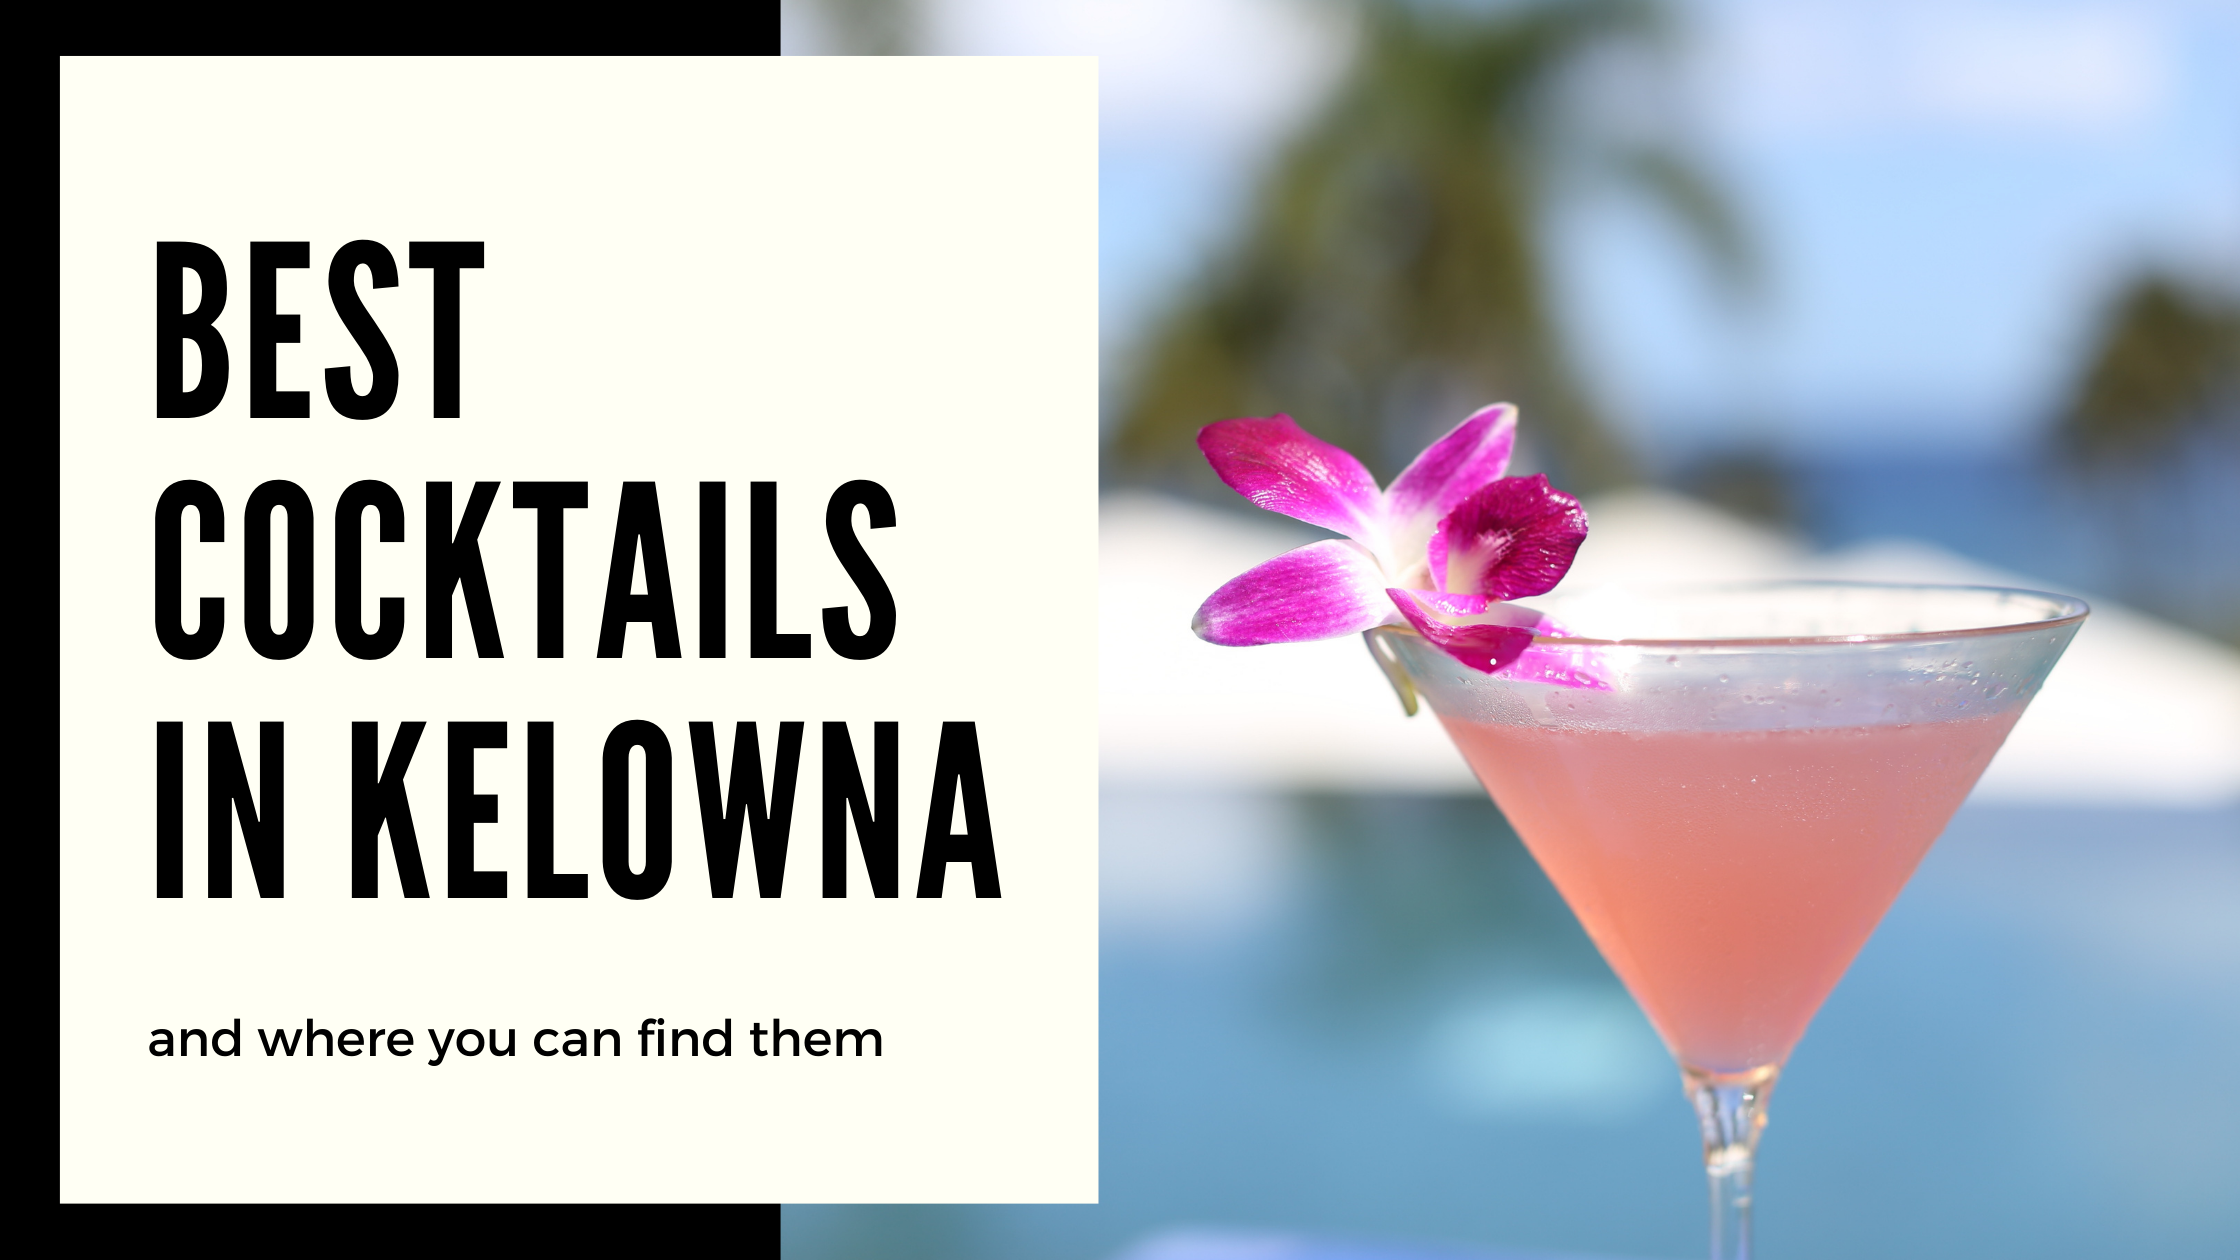 Best Cocktails In Kelowna